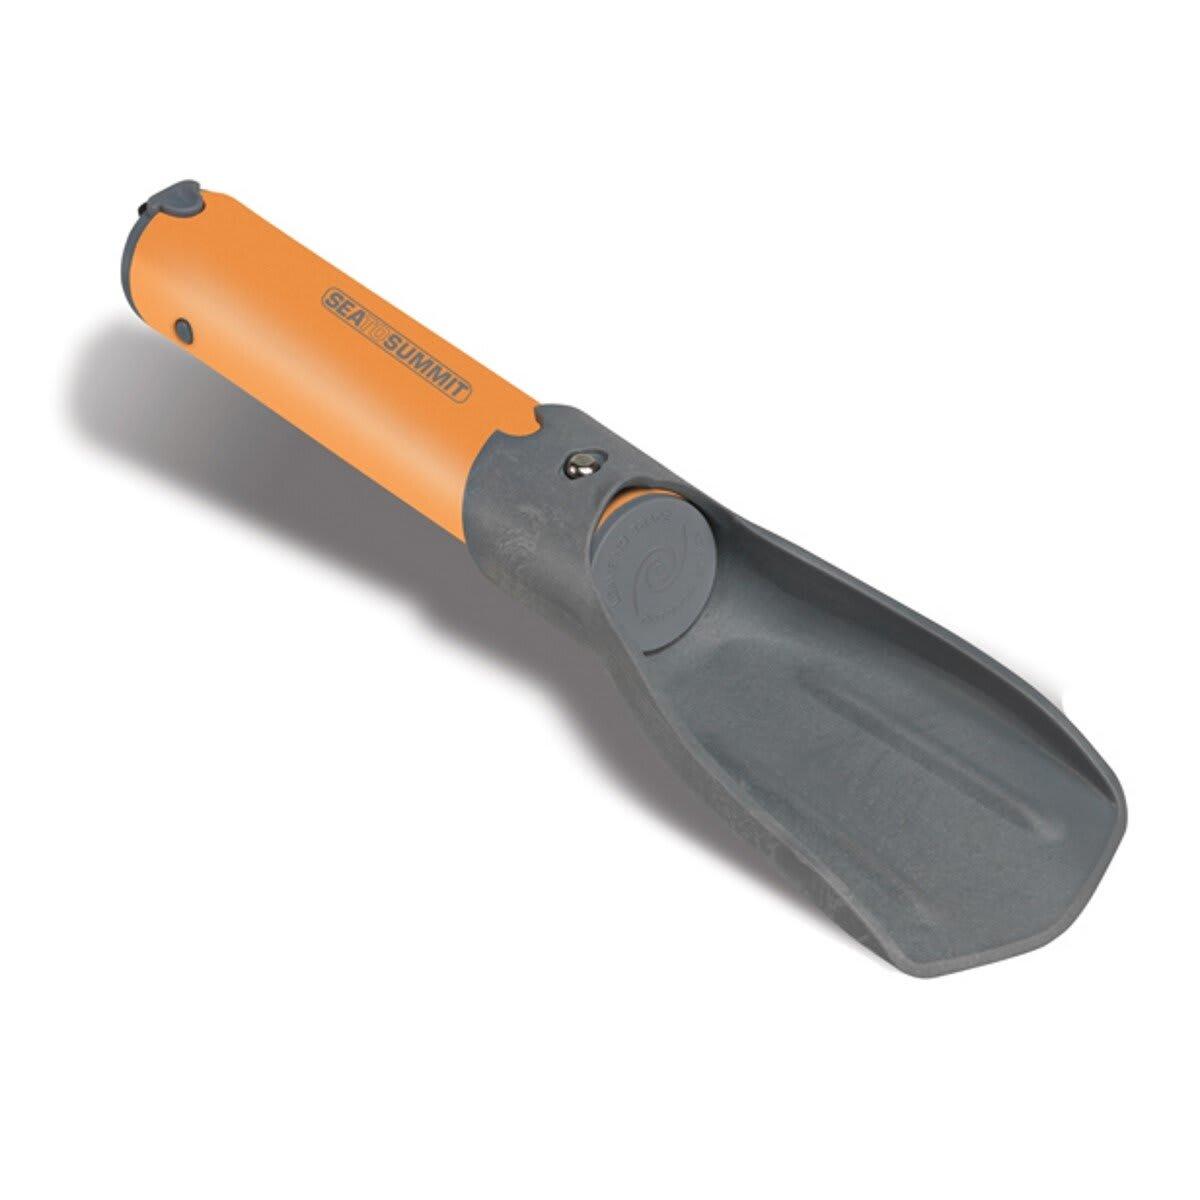 S2S Pocket Trowel